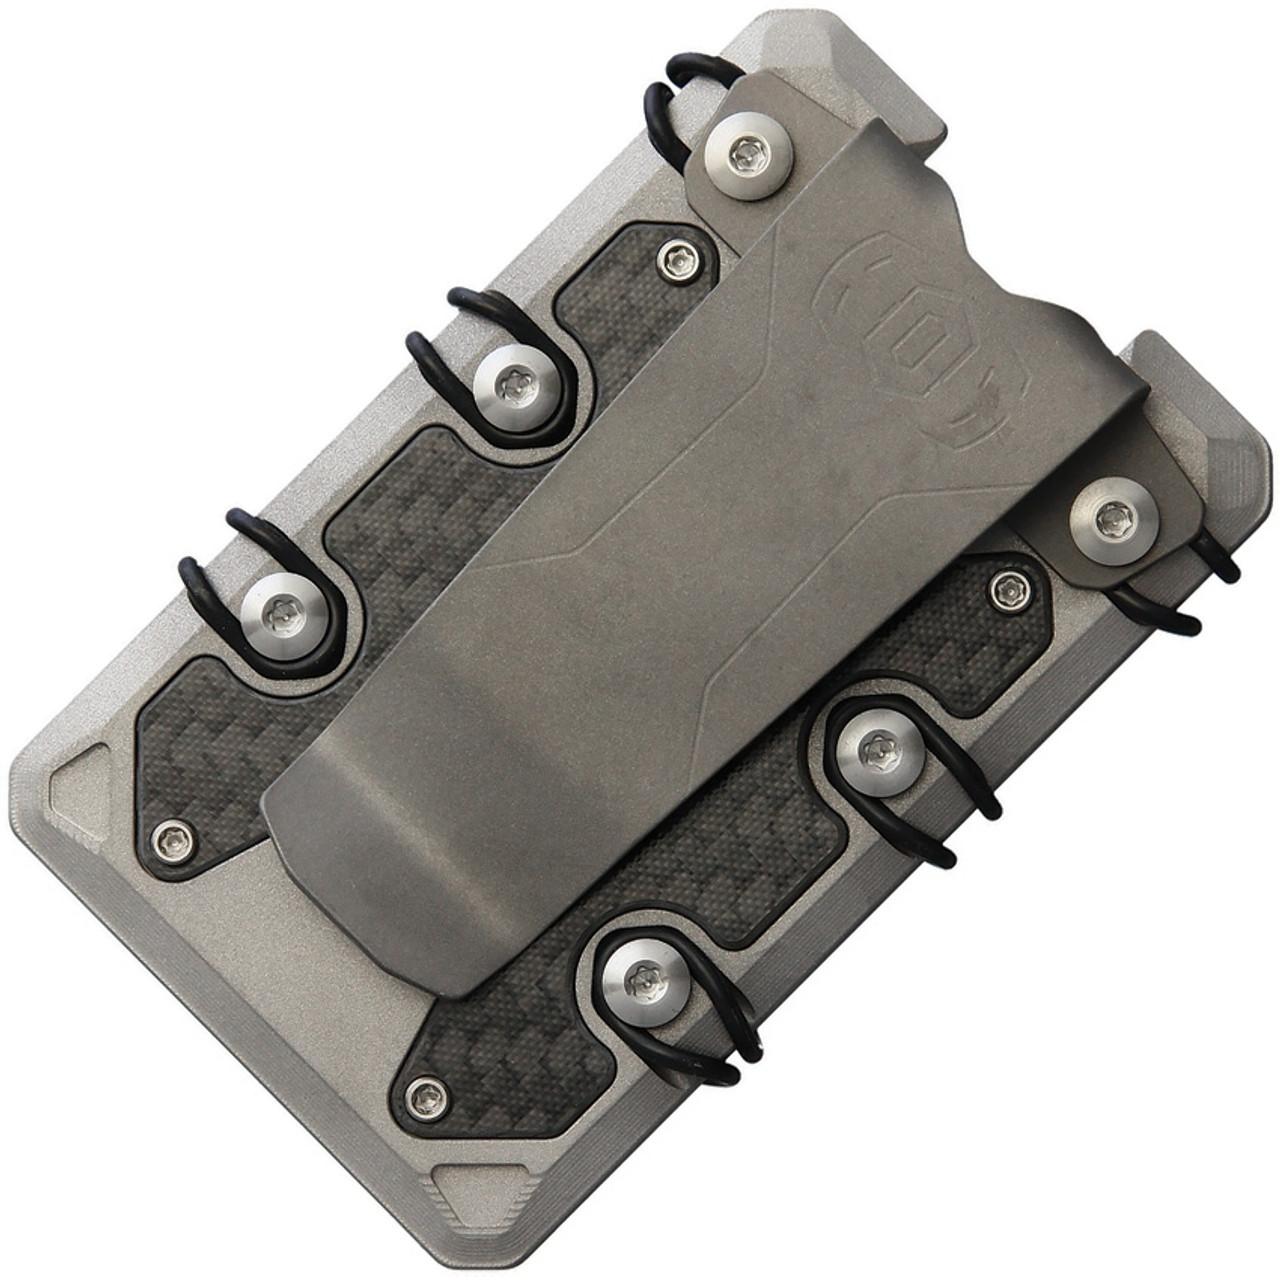 EOS 3.0 Bead Blast Wallet EOS052, Stonewashed Titanium Construction, Silver Anodized Hardware